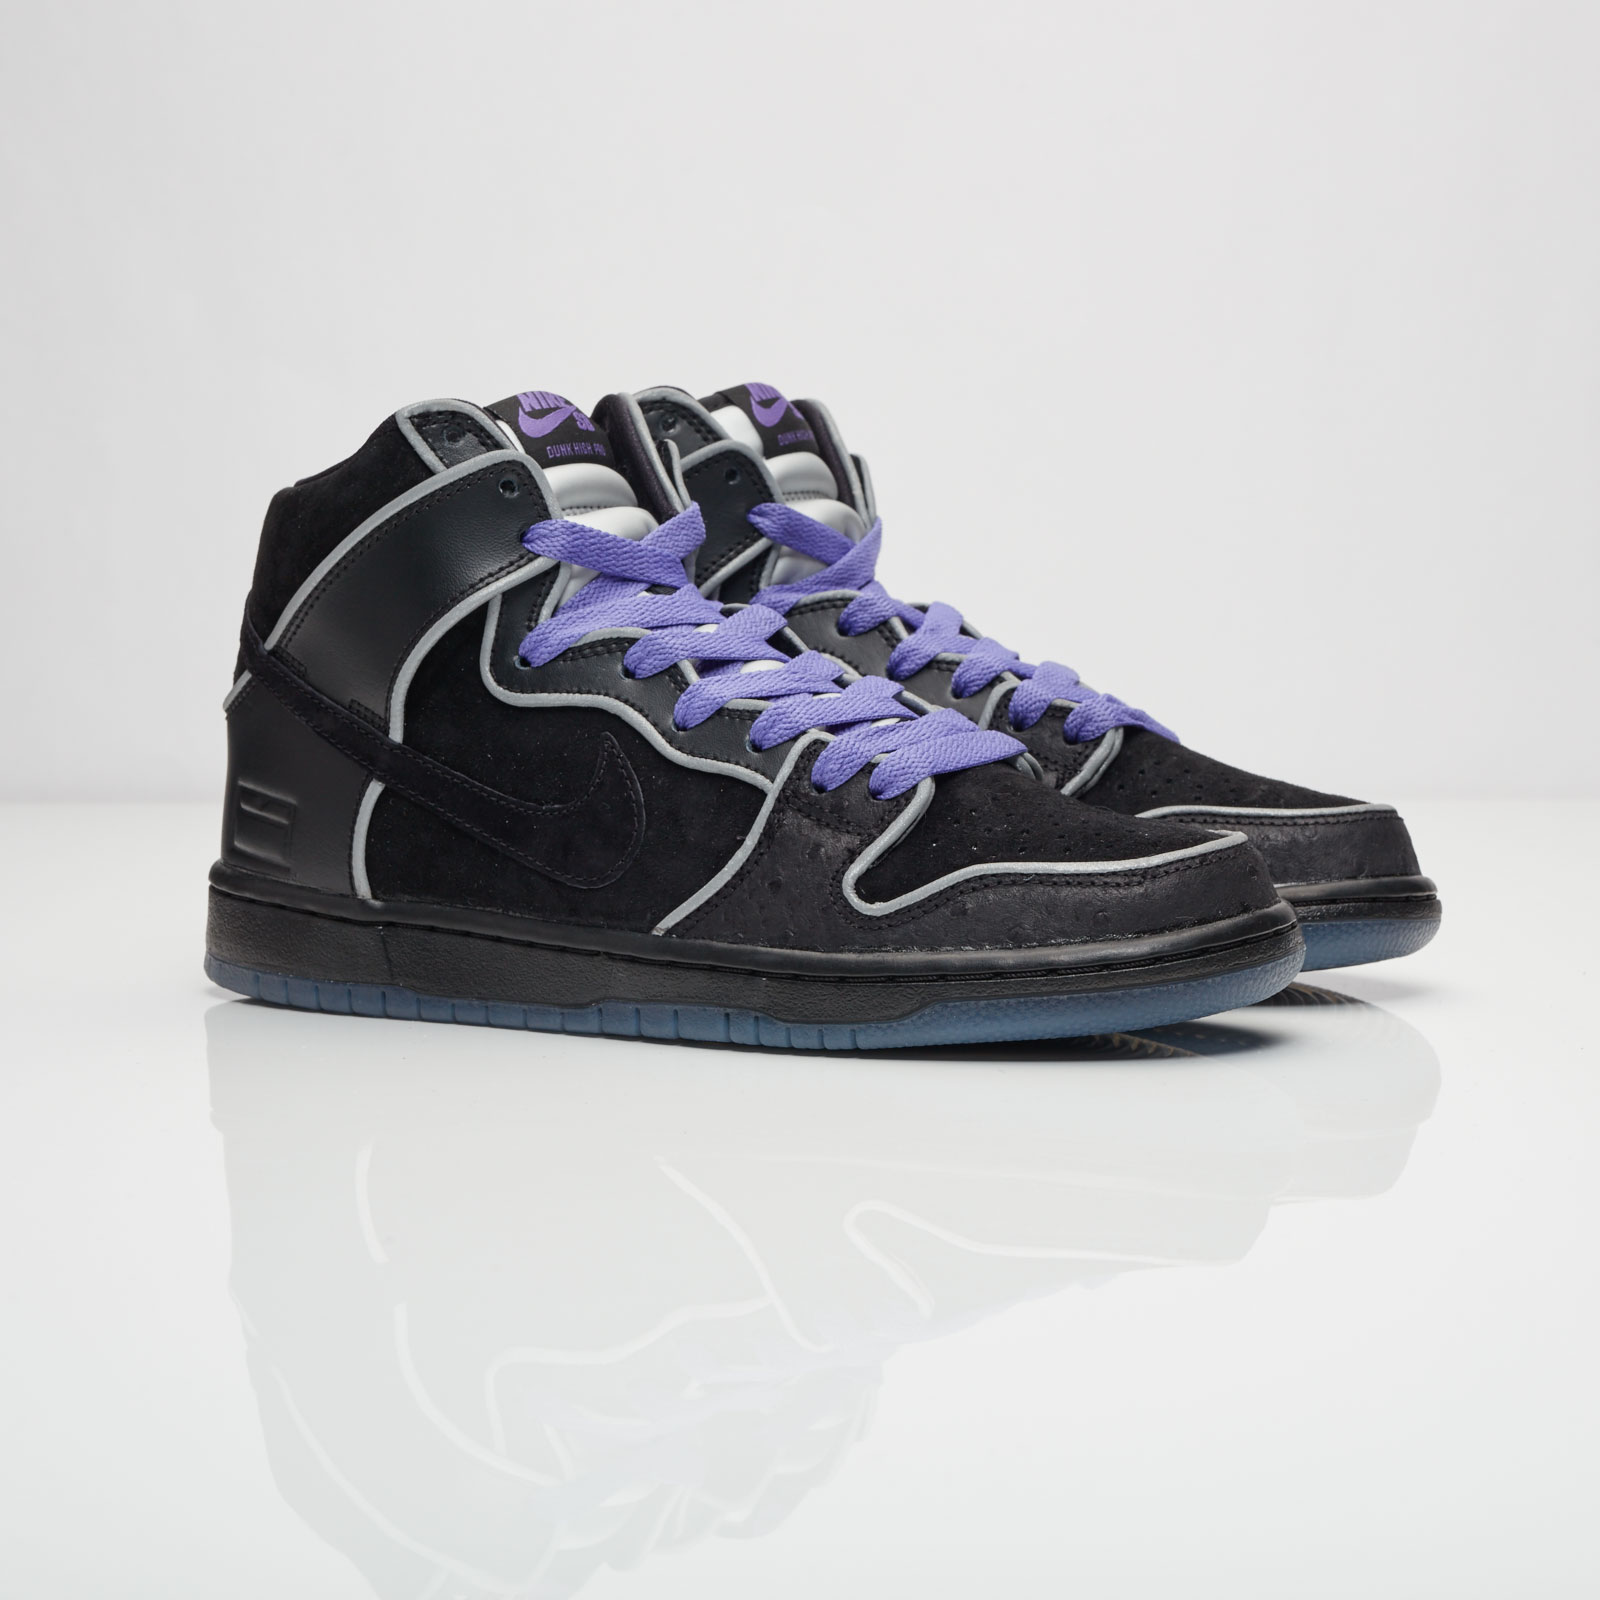 half off 43c1b 5a2b4 Nike Dunk High Elite Sb - 833456-002 - Sneakersnstuff ...